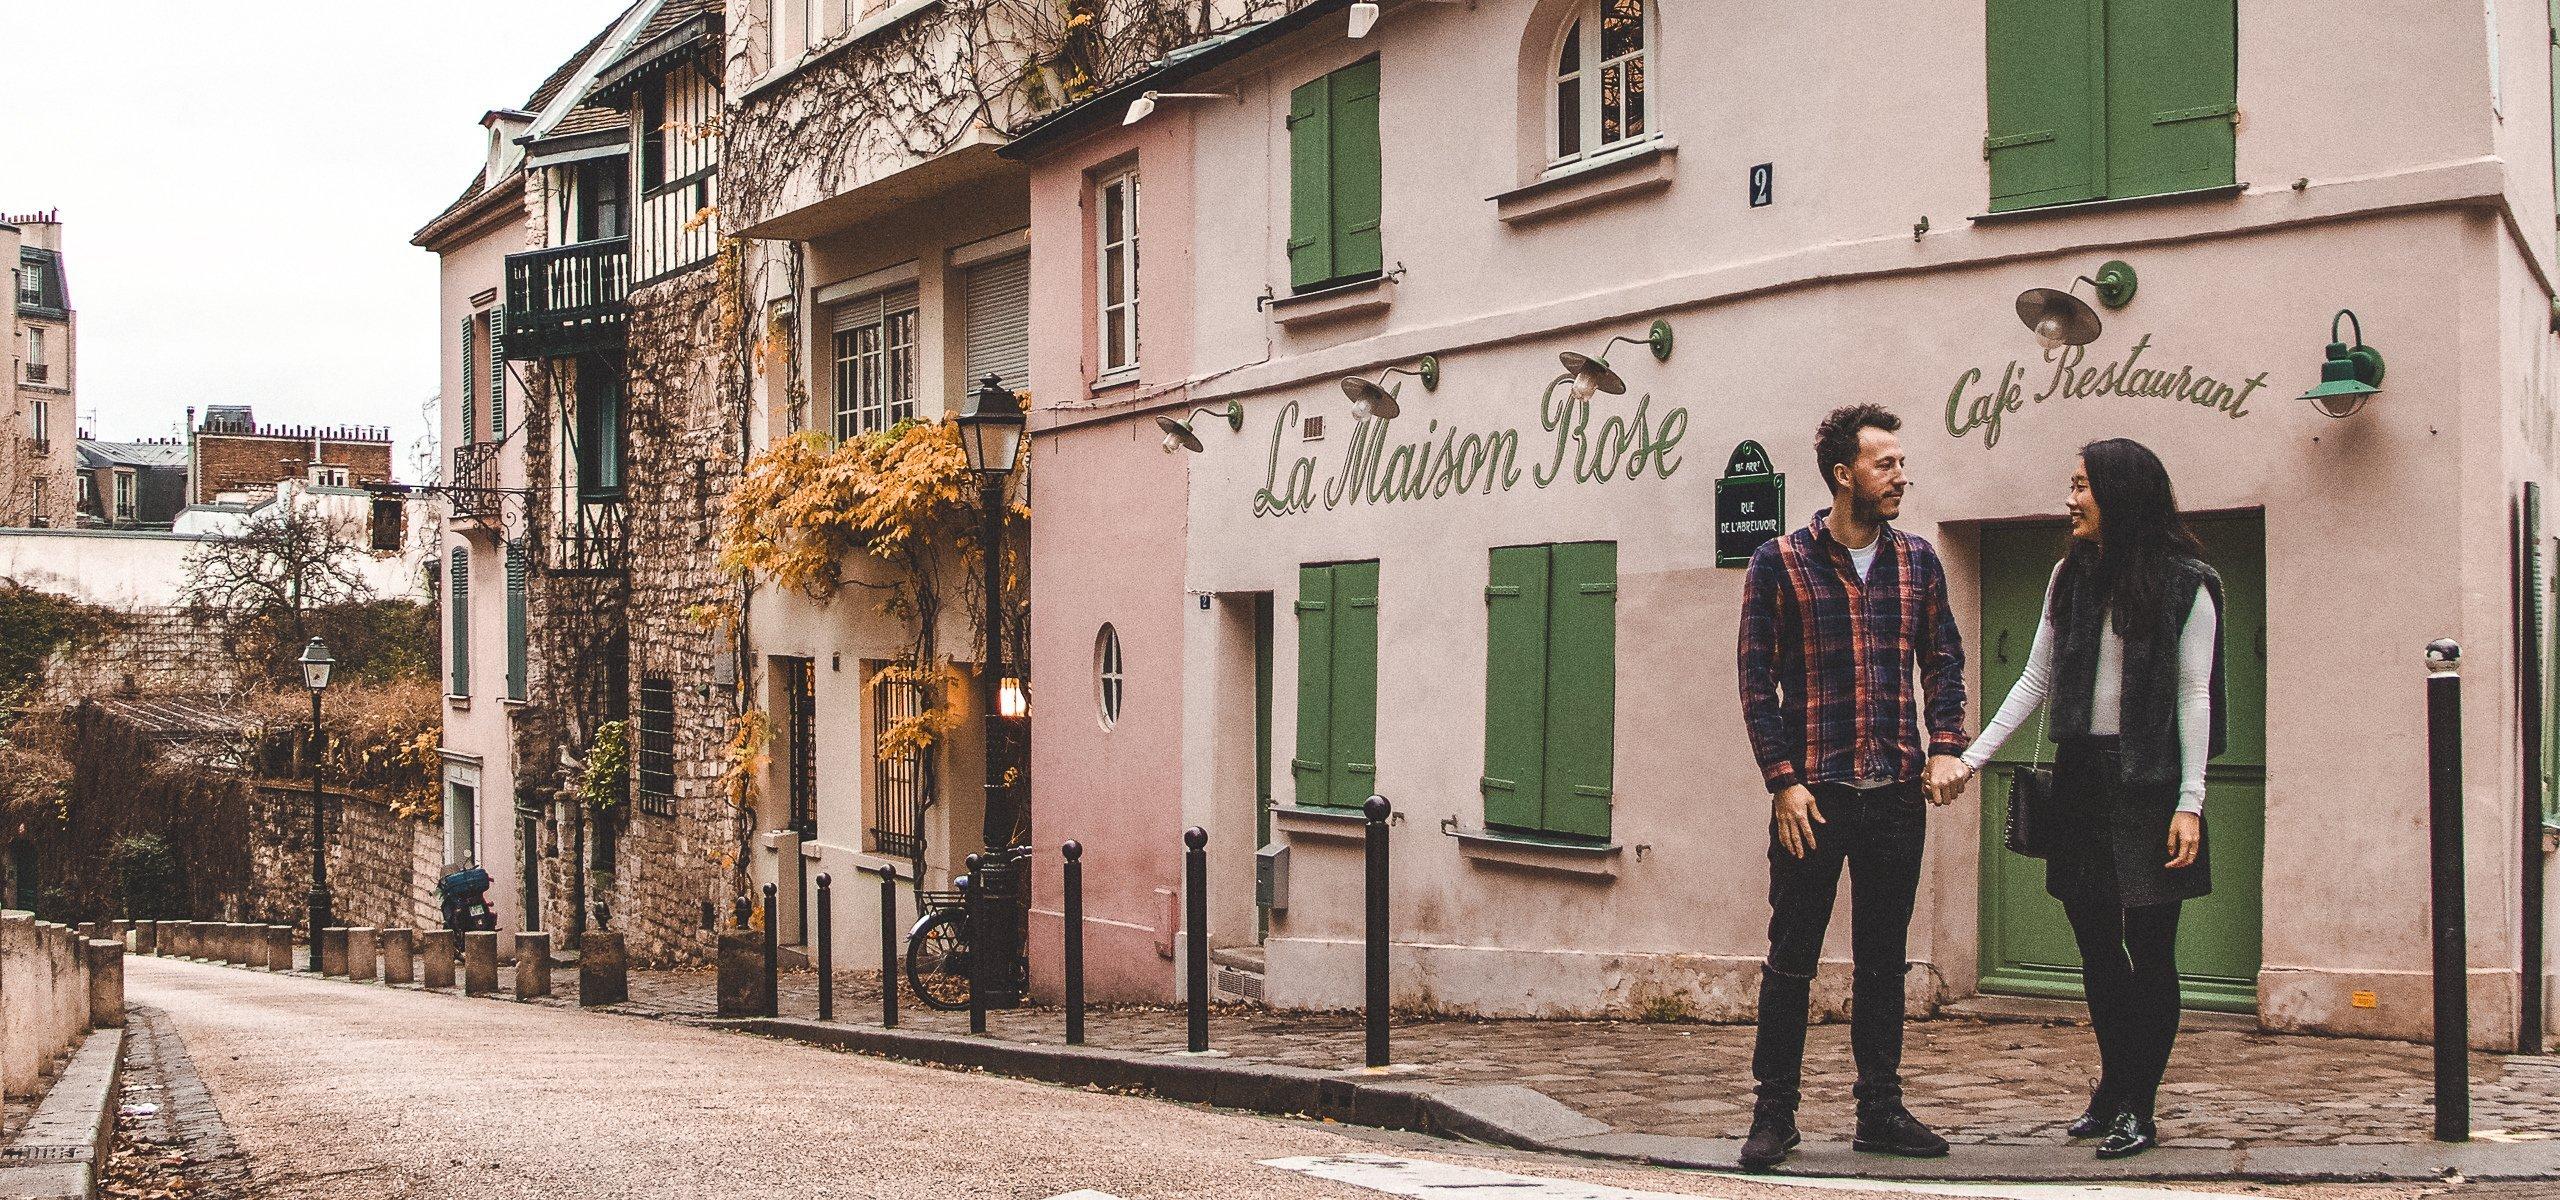 A couple holds hands In front of La Maison Rose, Montmartre, Paris - Travelling with Parents